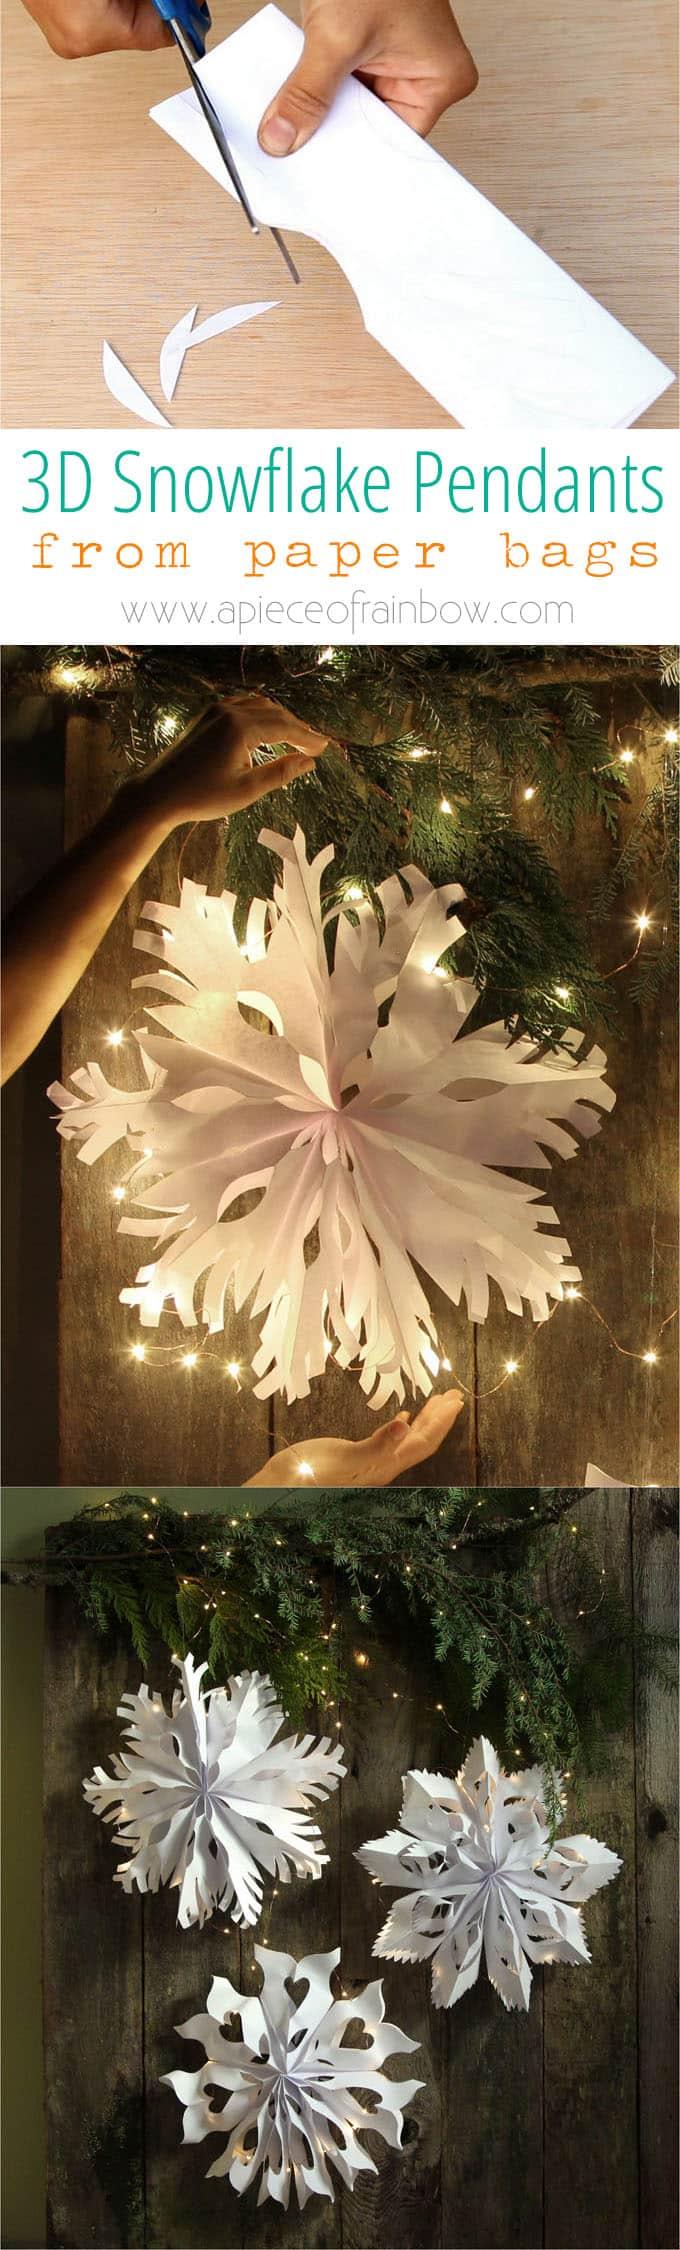 paper-bag-snowflake-pendants-apieceofrainbowblog-2